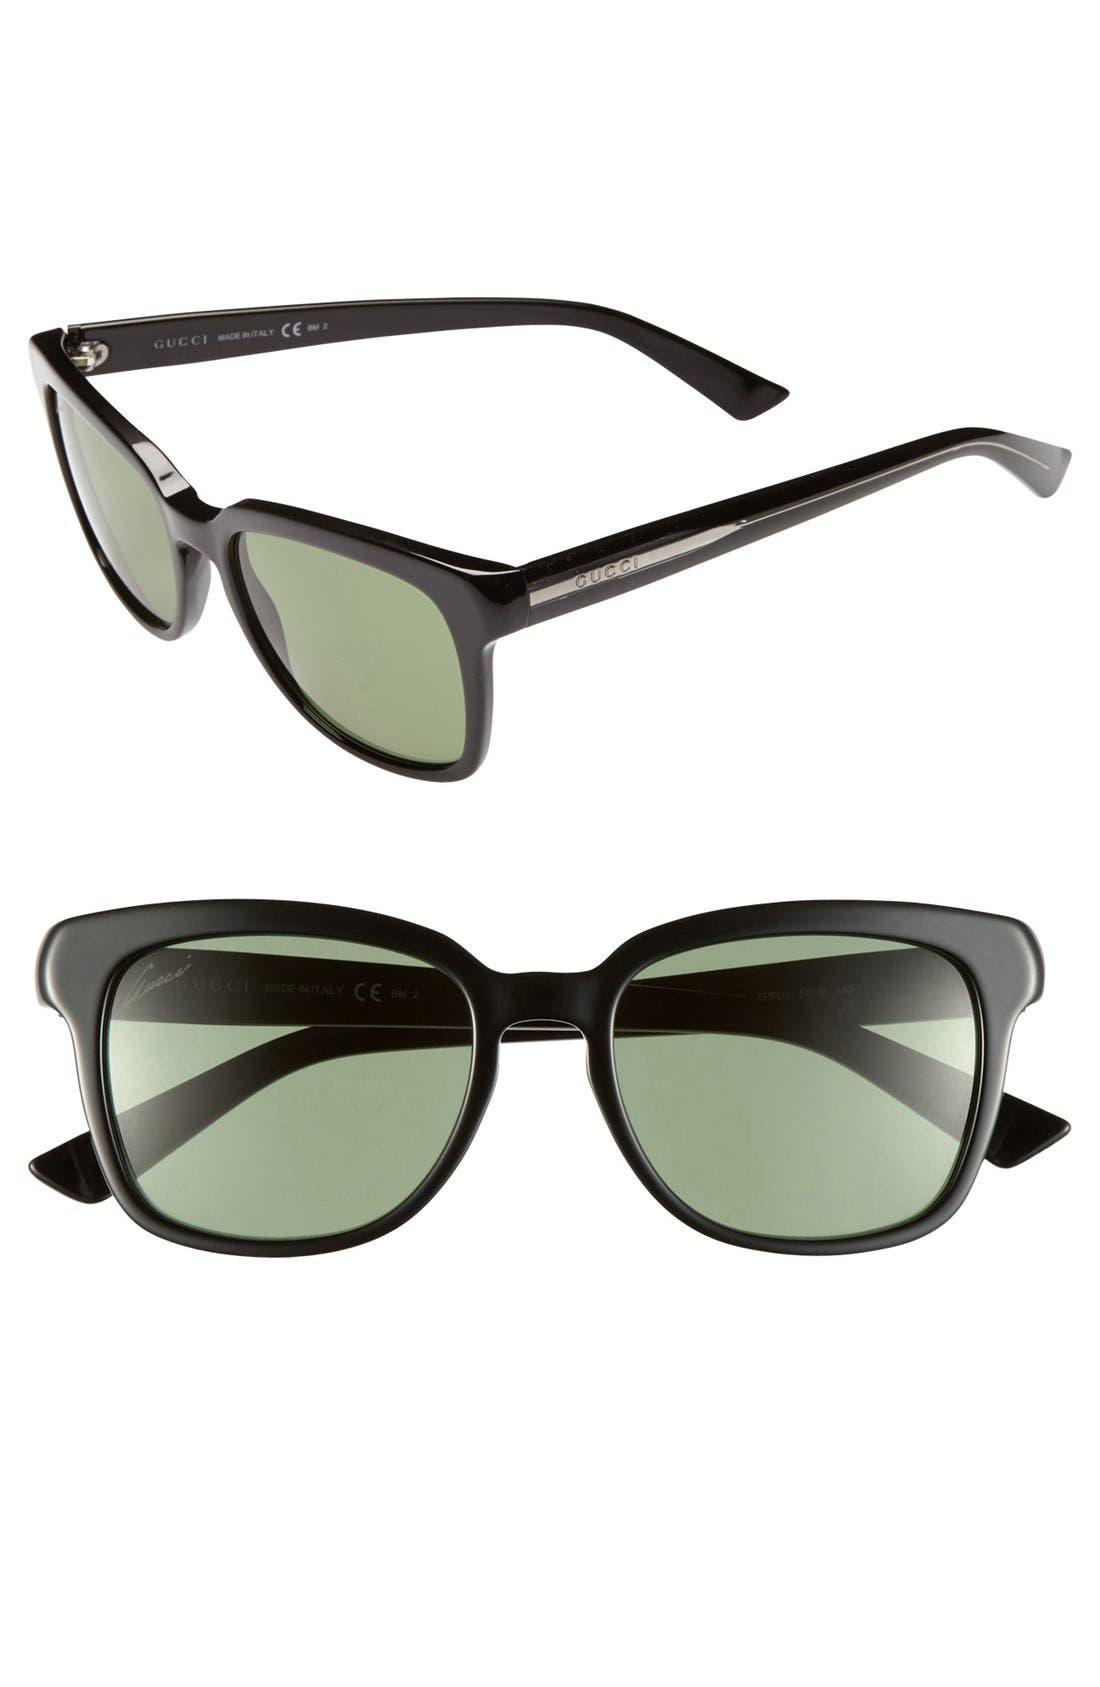 Main Image - Gucci 51mm Sunglasses